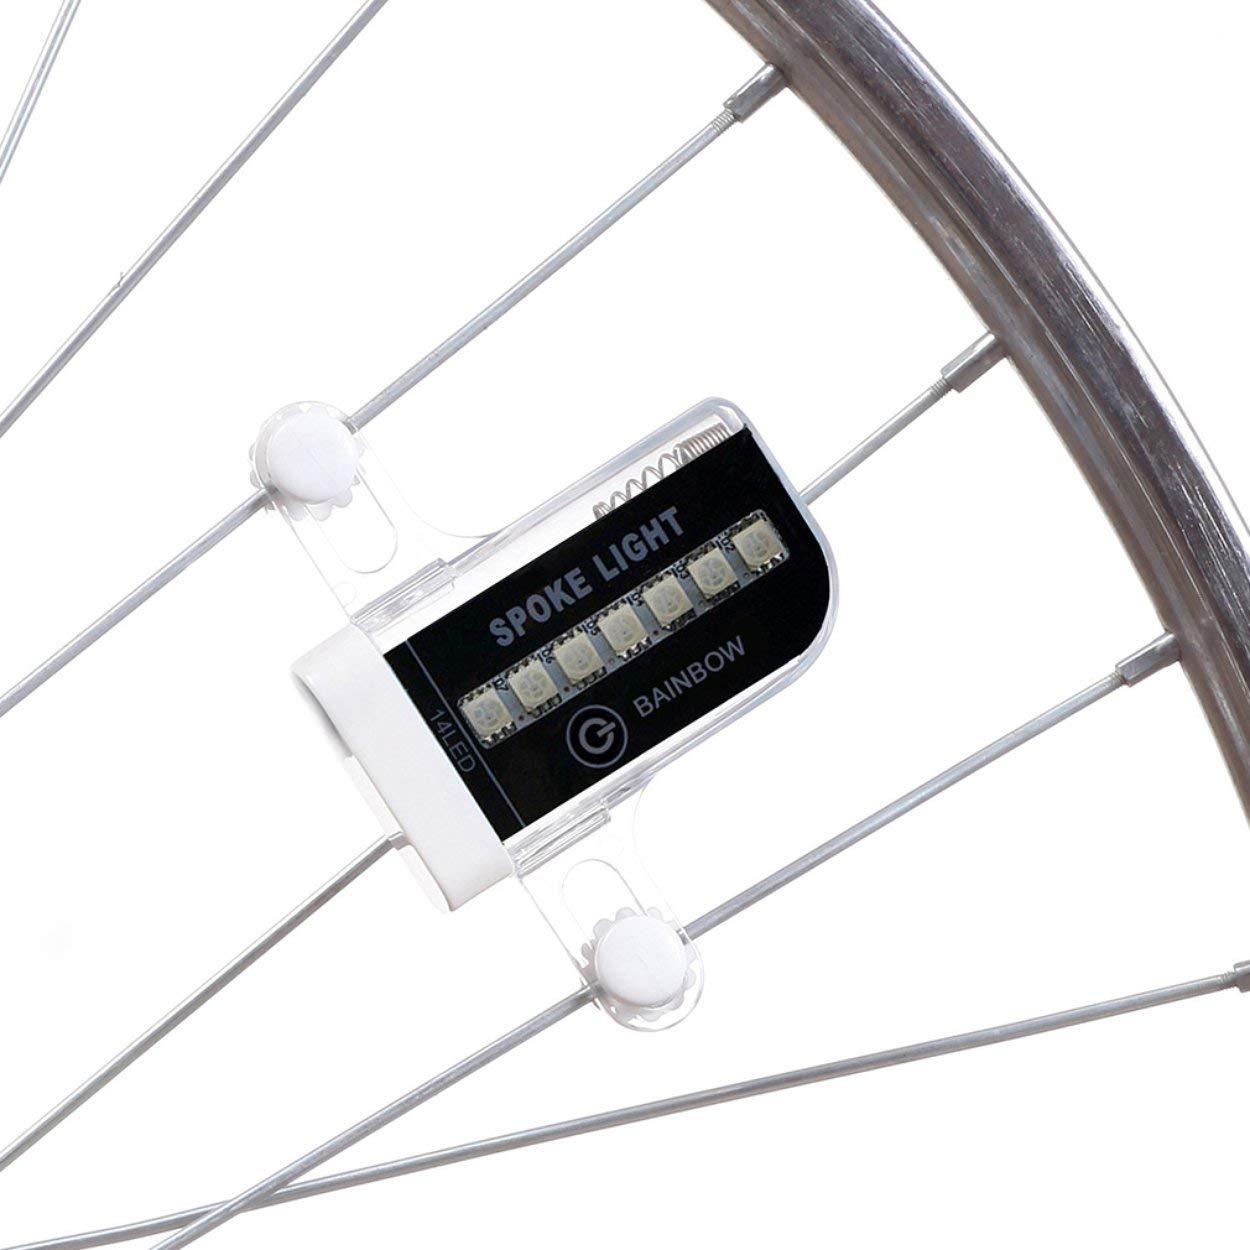 Lorenlli 14 LED 30 Patrones a Todo Color Colorido Spoke Light Ciclismo Mountain Bike Spoke Rueda de la l/ámpara de Carga Fit KX-071B Accesorios para Bicicletas